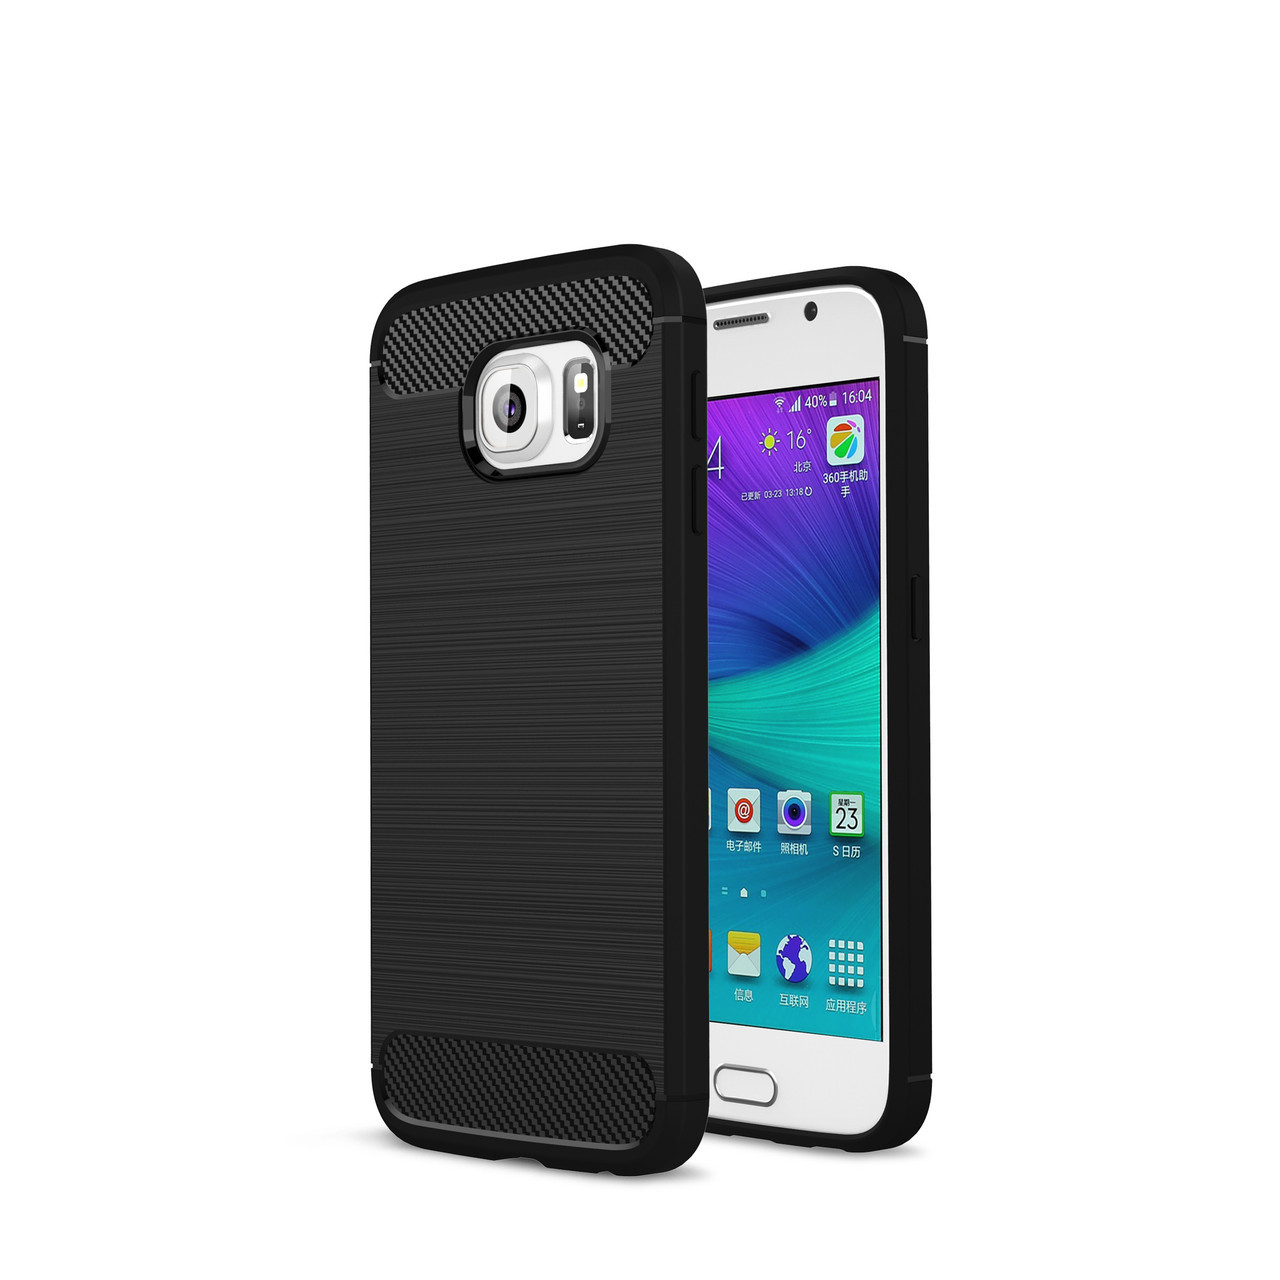 Чехол для Samung Galaxy S6 Carbon